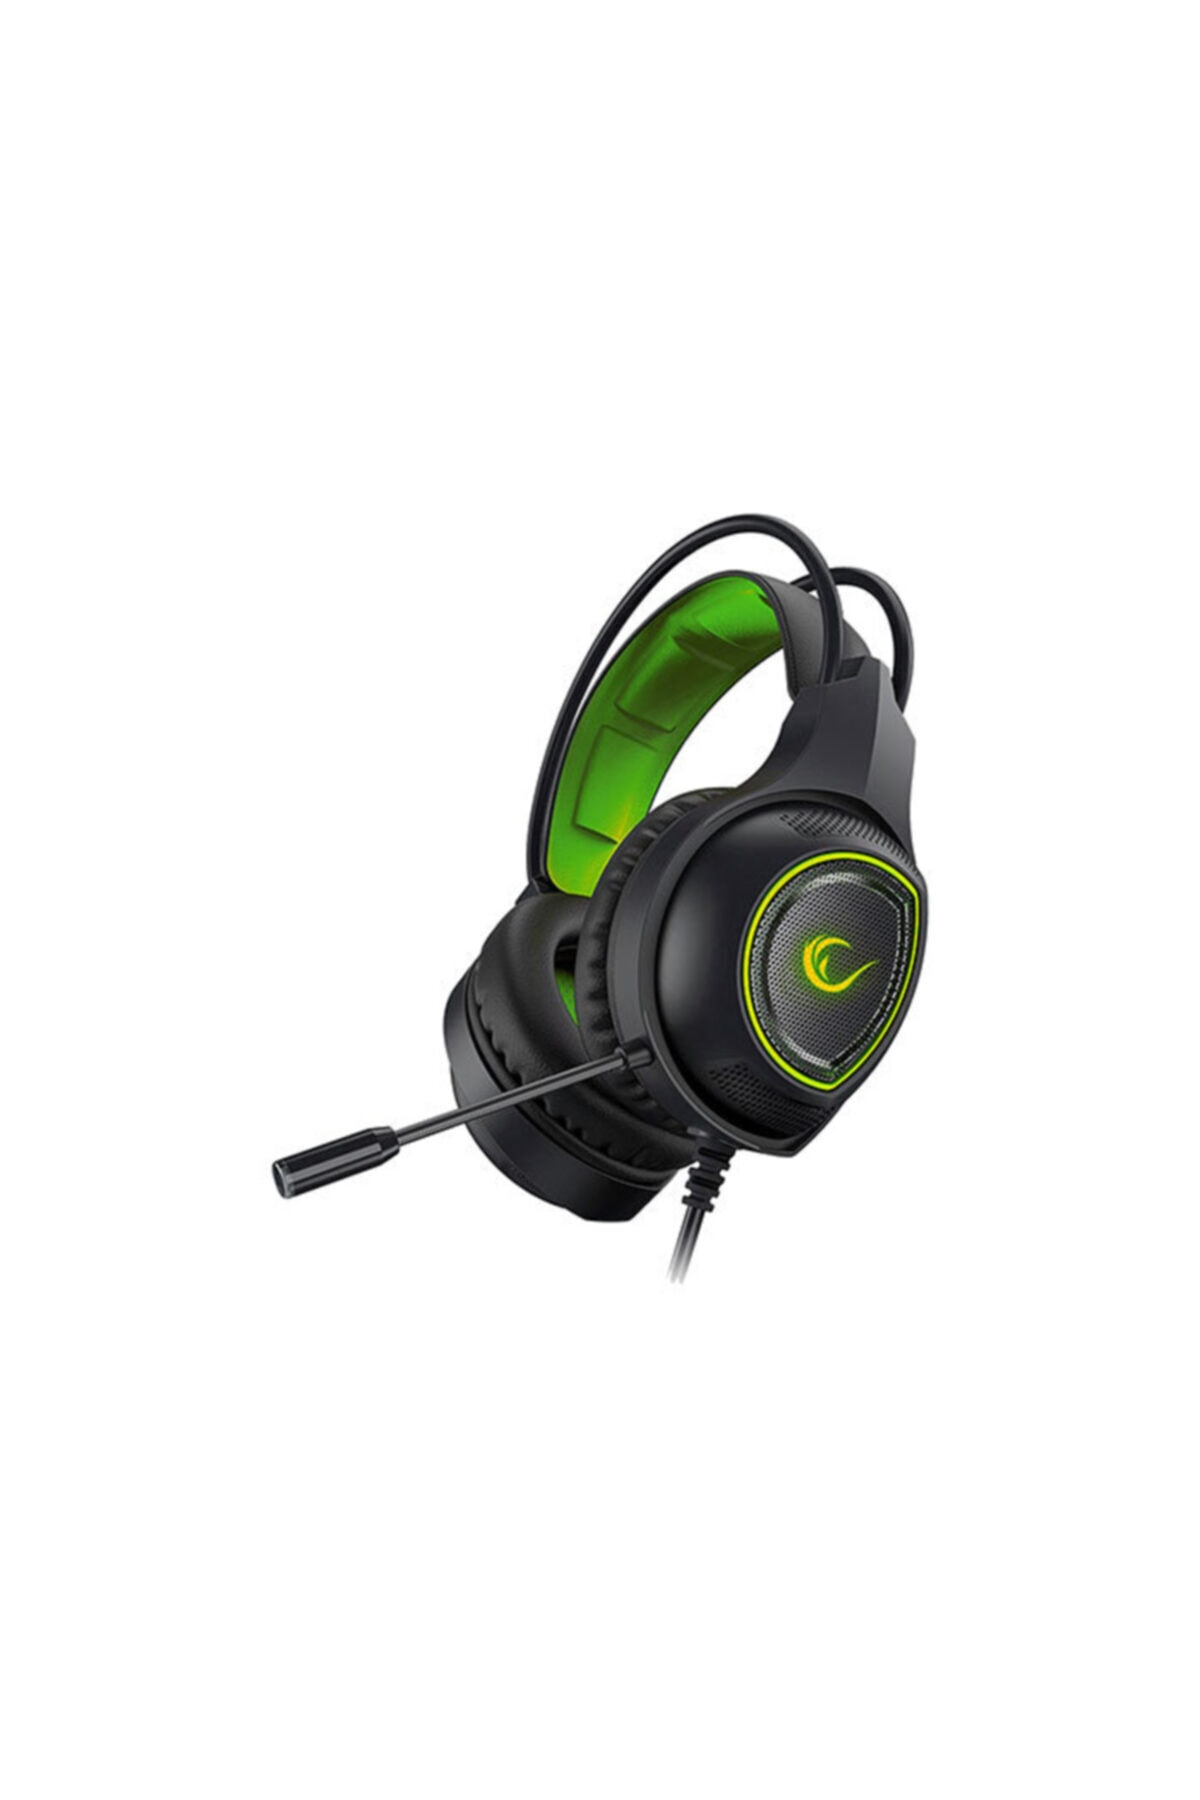 Rampage Rm-k23 Mıssıon Yeşil Gaming Oyuncu Mikrofonlu Kulaklık